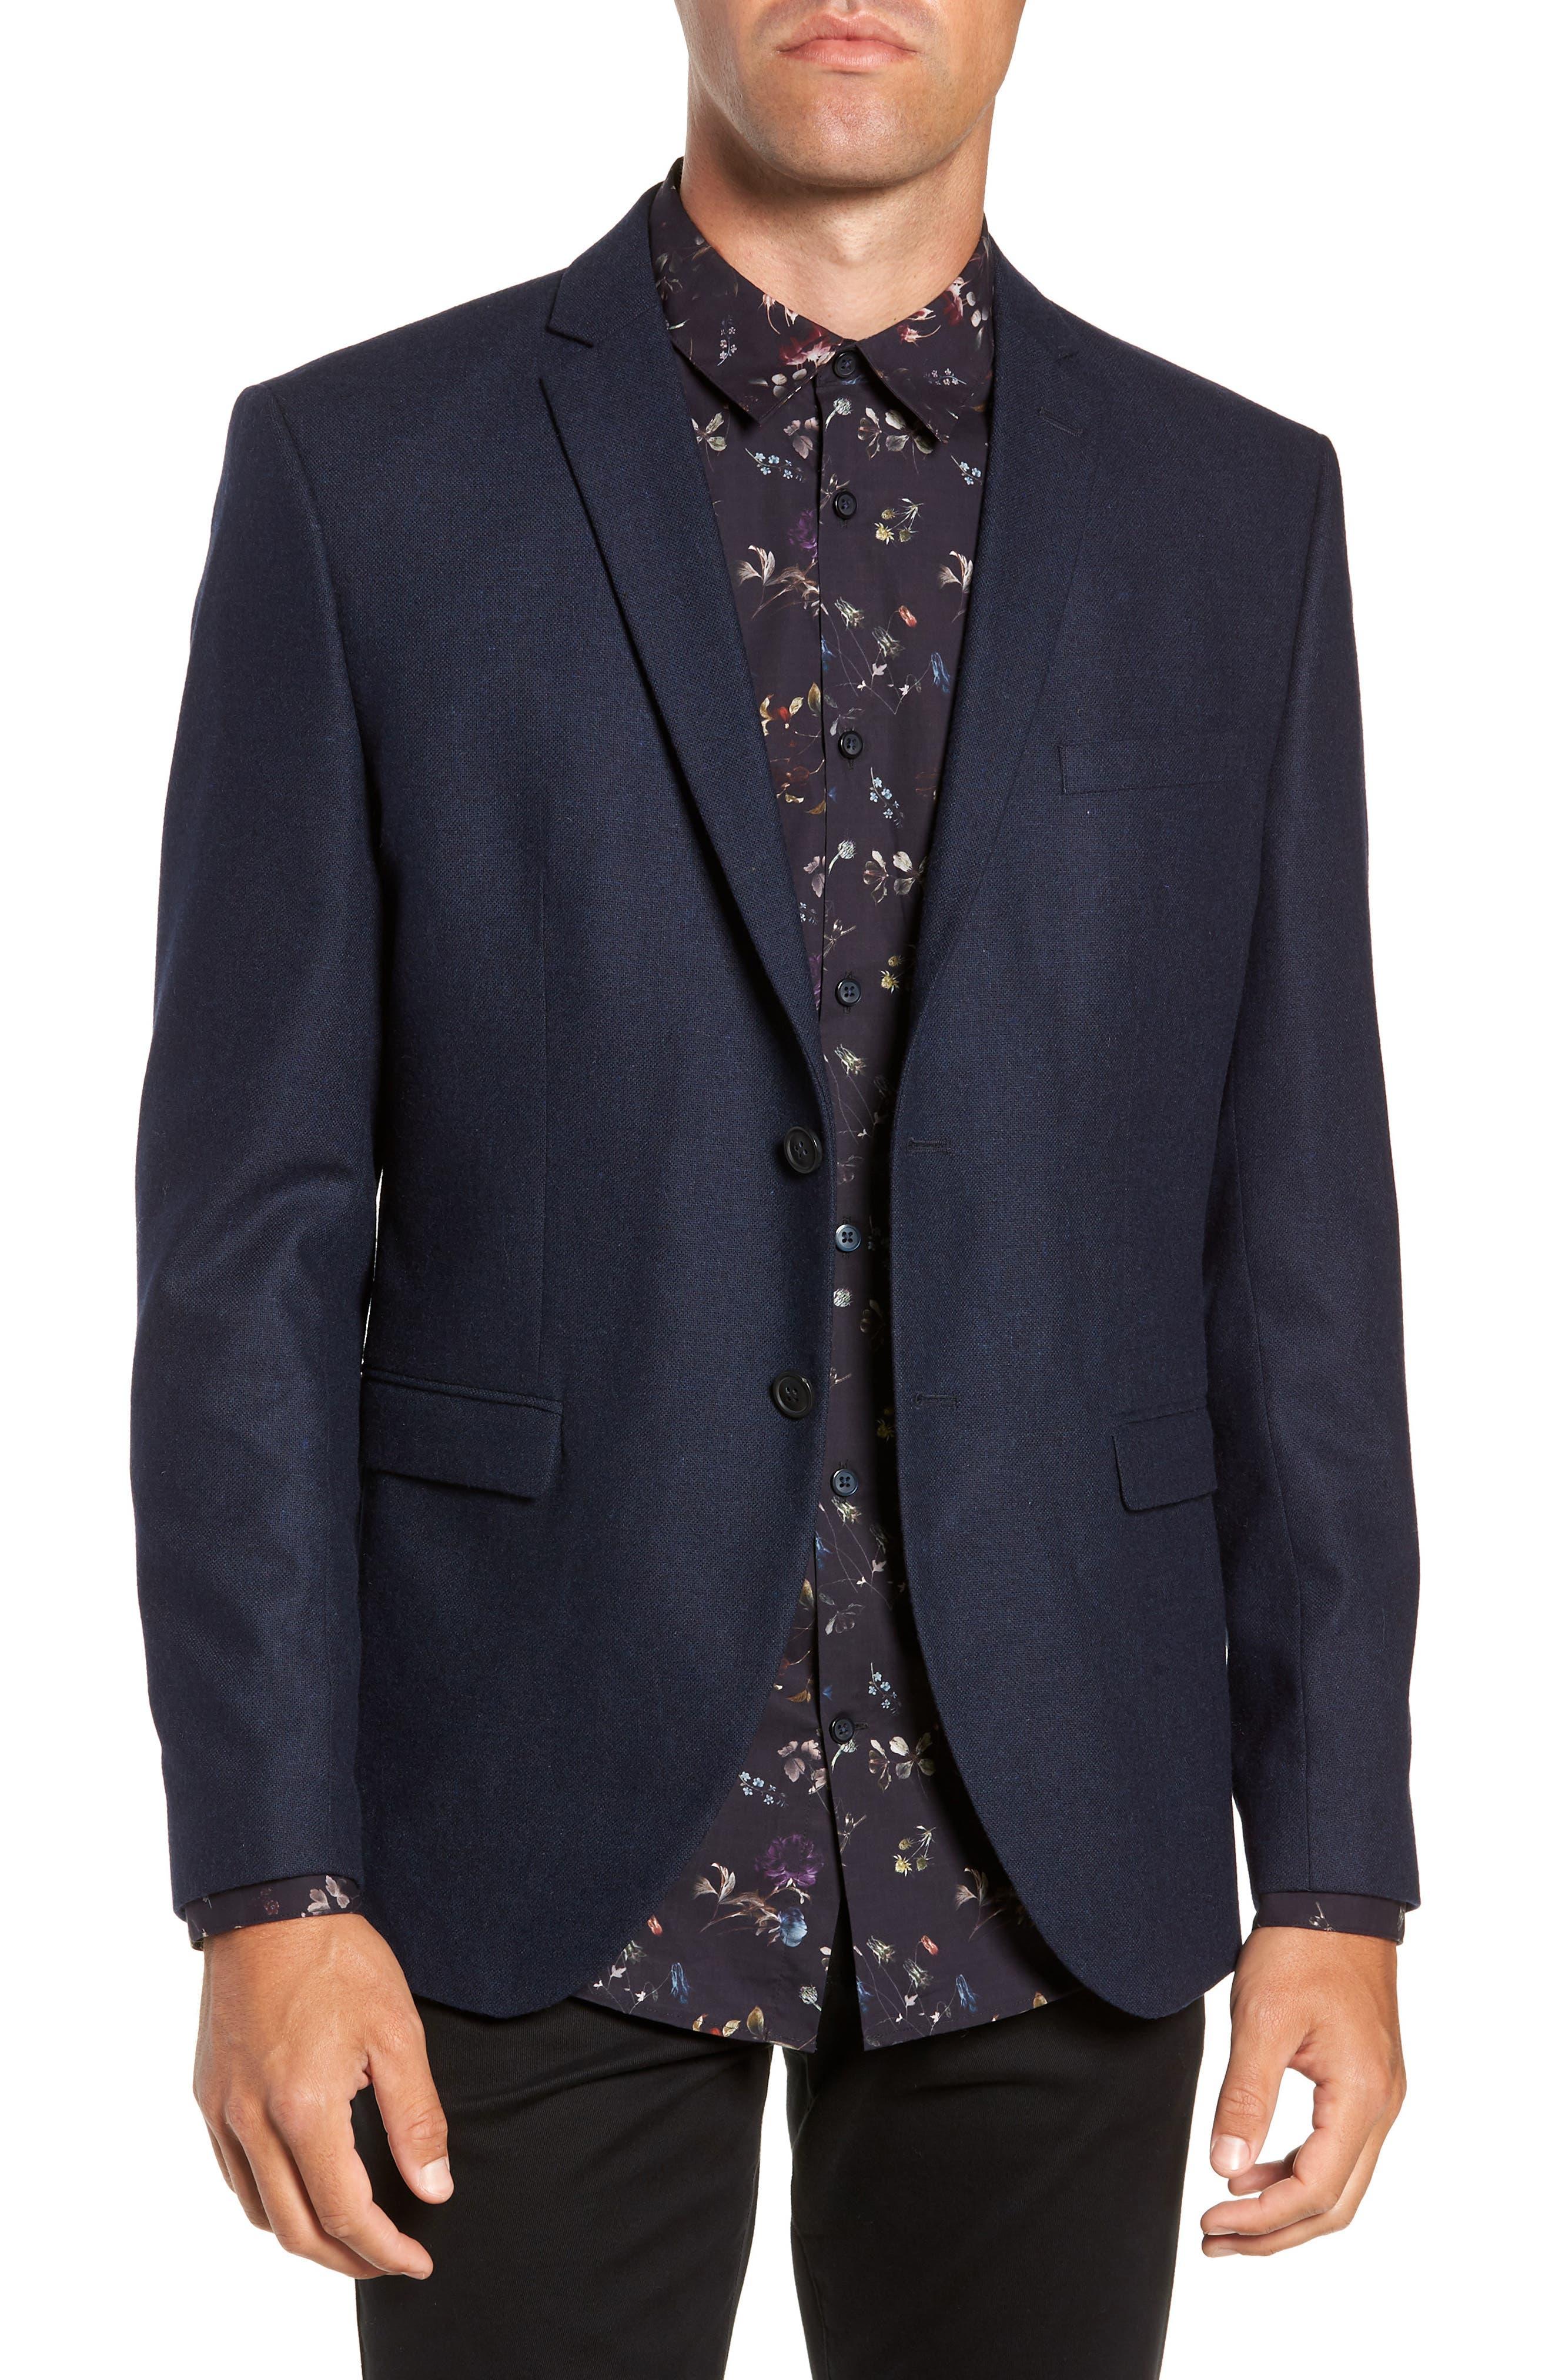 Myloiver Slim Fit Wool Blend Blazer,                             Main thumbnail 1, color,                             DARK NAVY